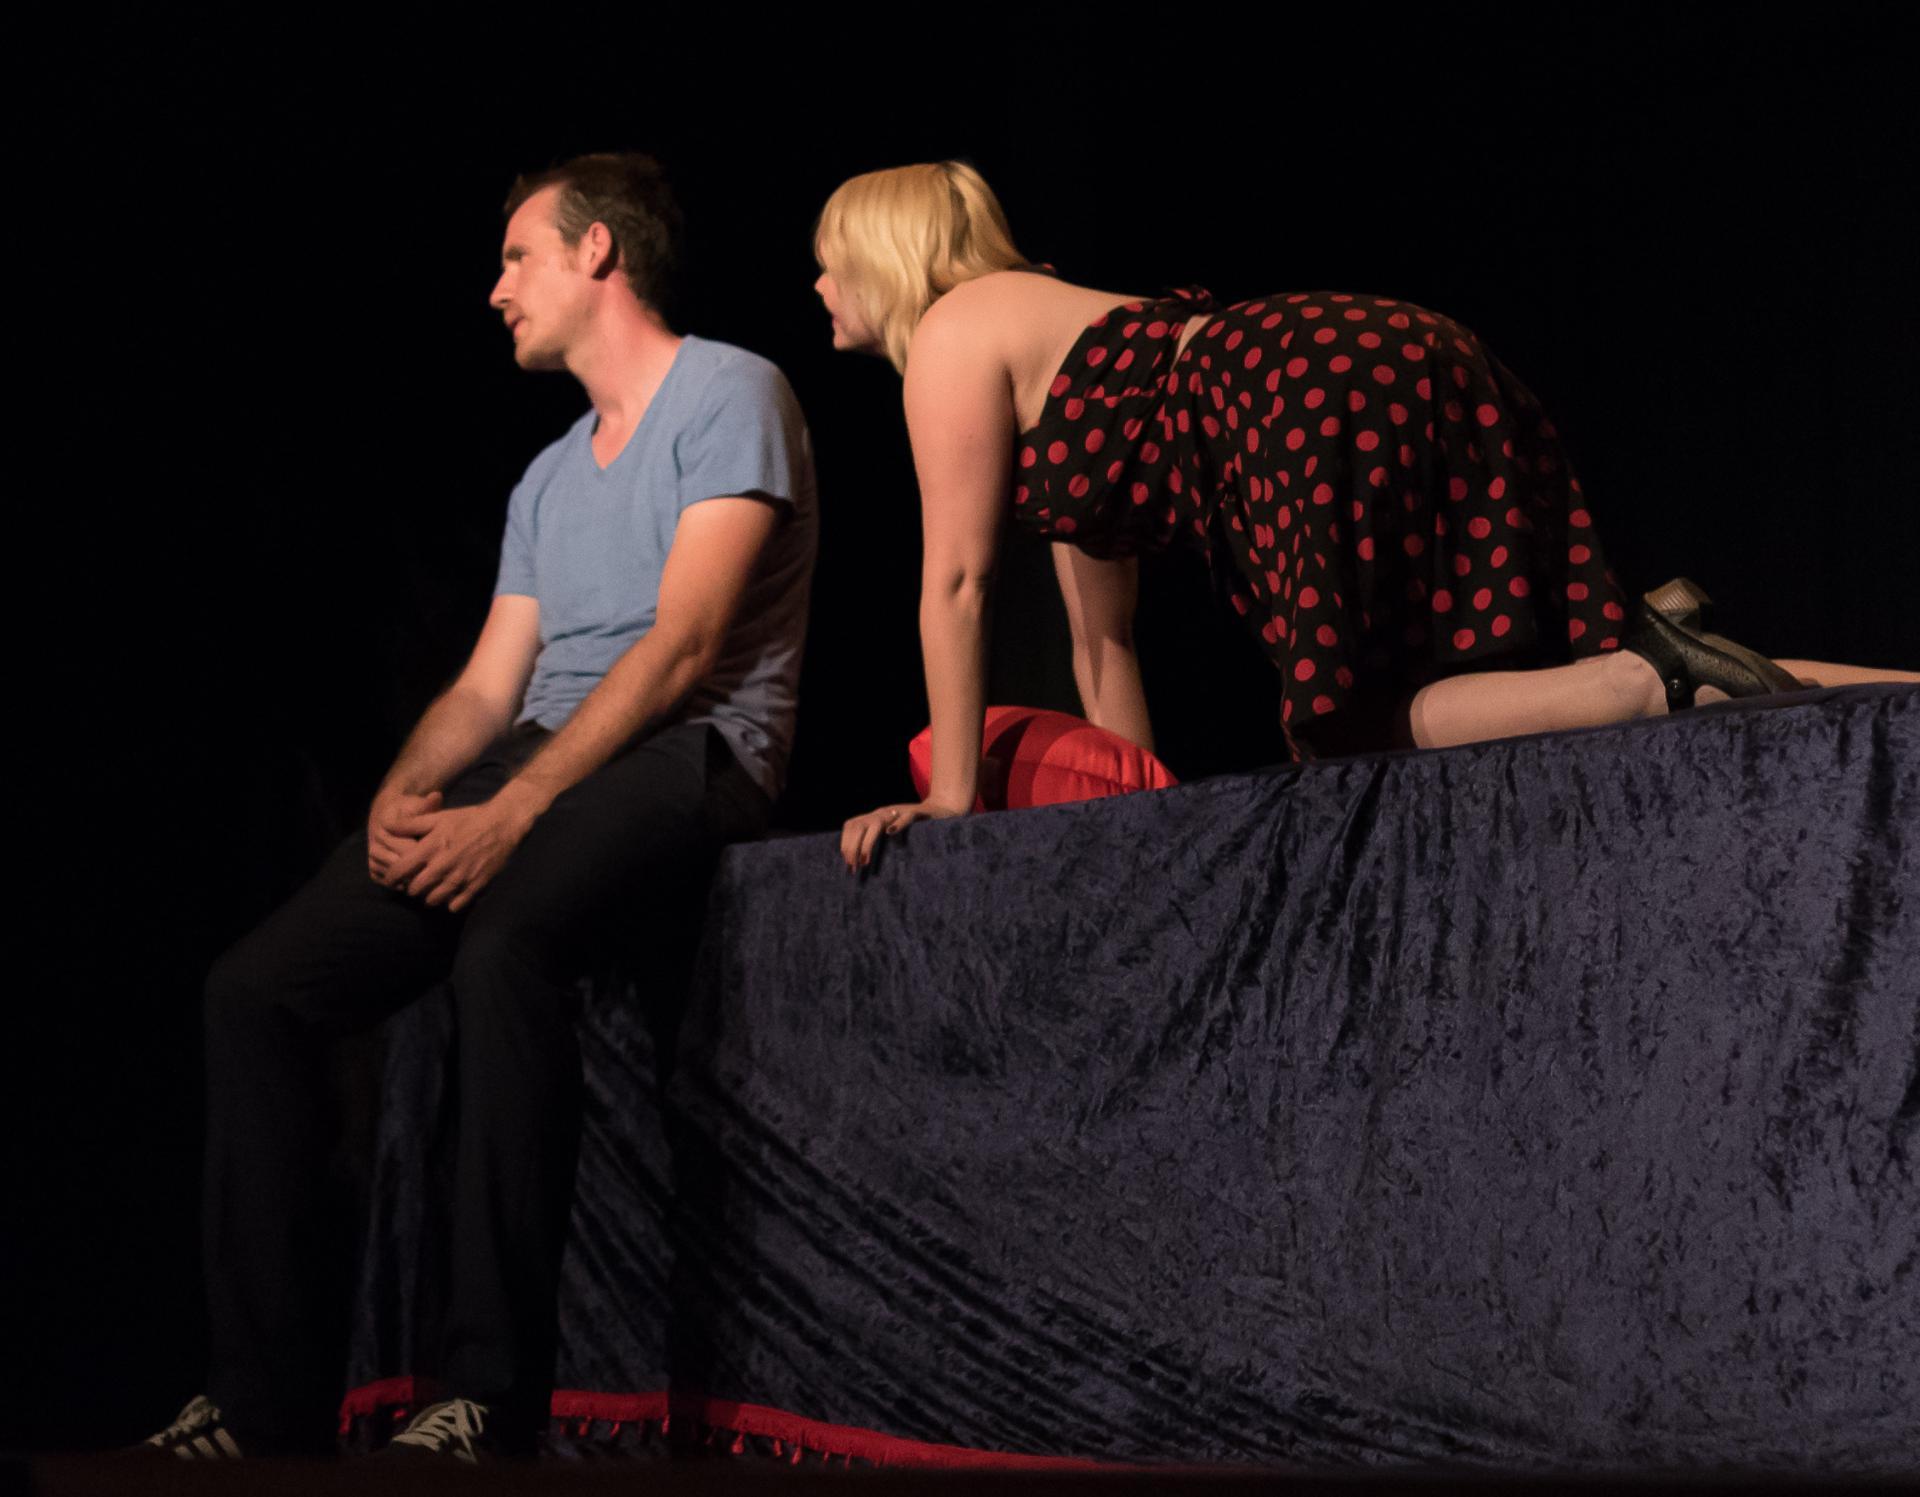 Sluimertijd - Theater TRAC